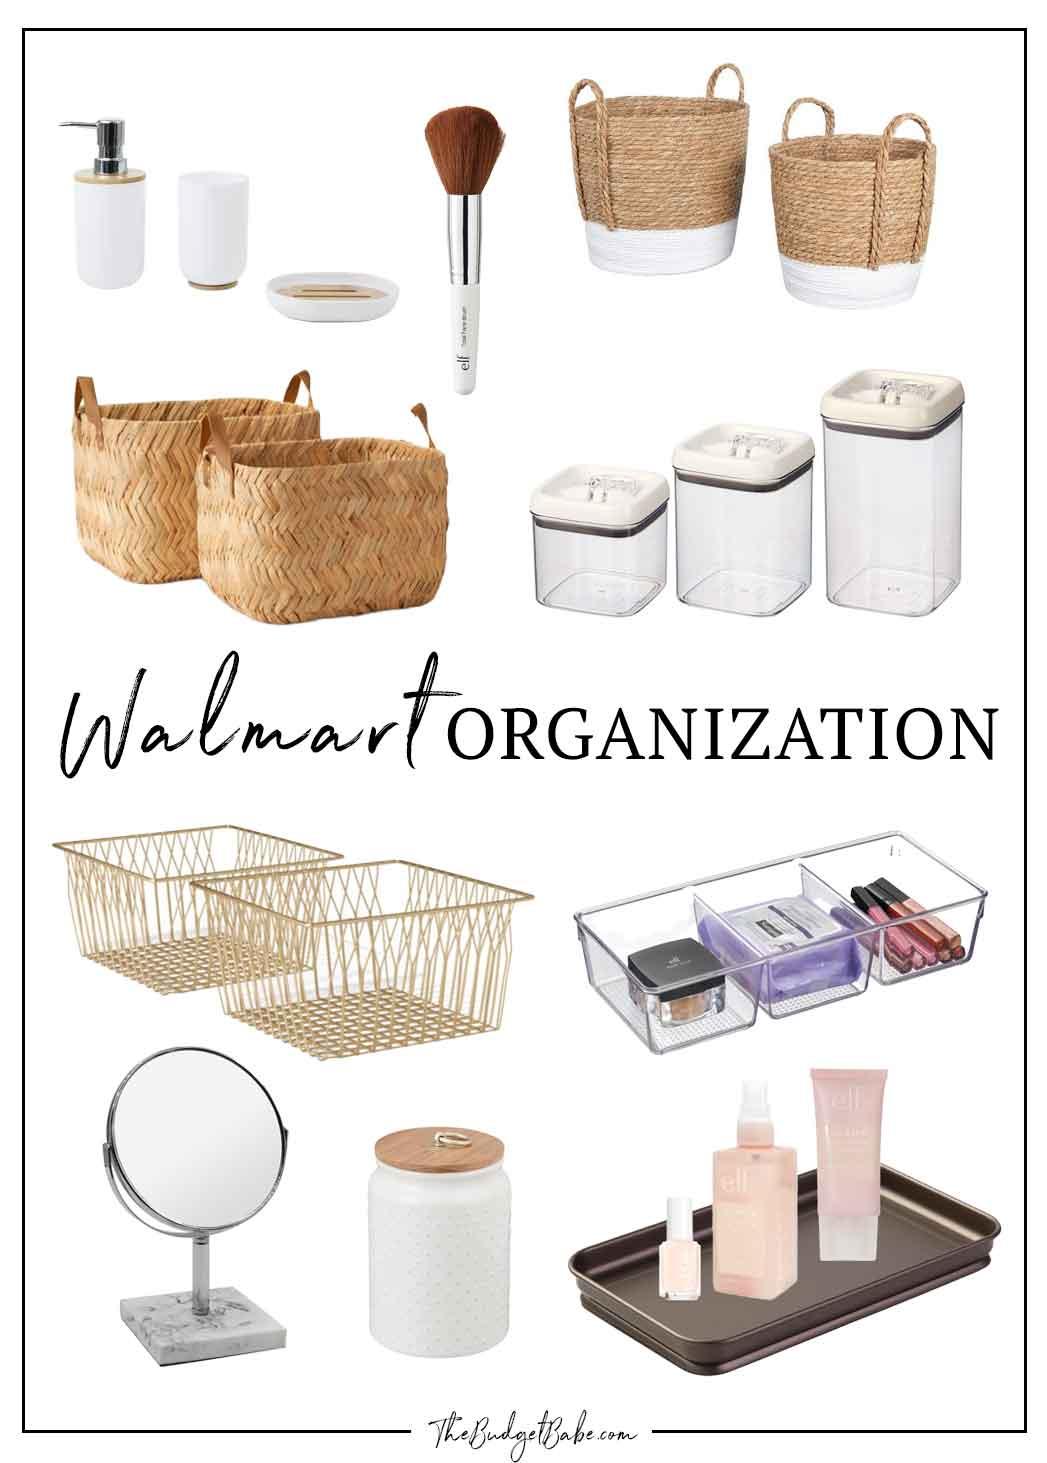 Walmart Organization Finds for Spring!